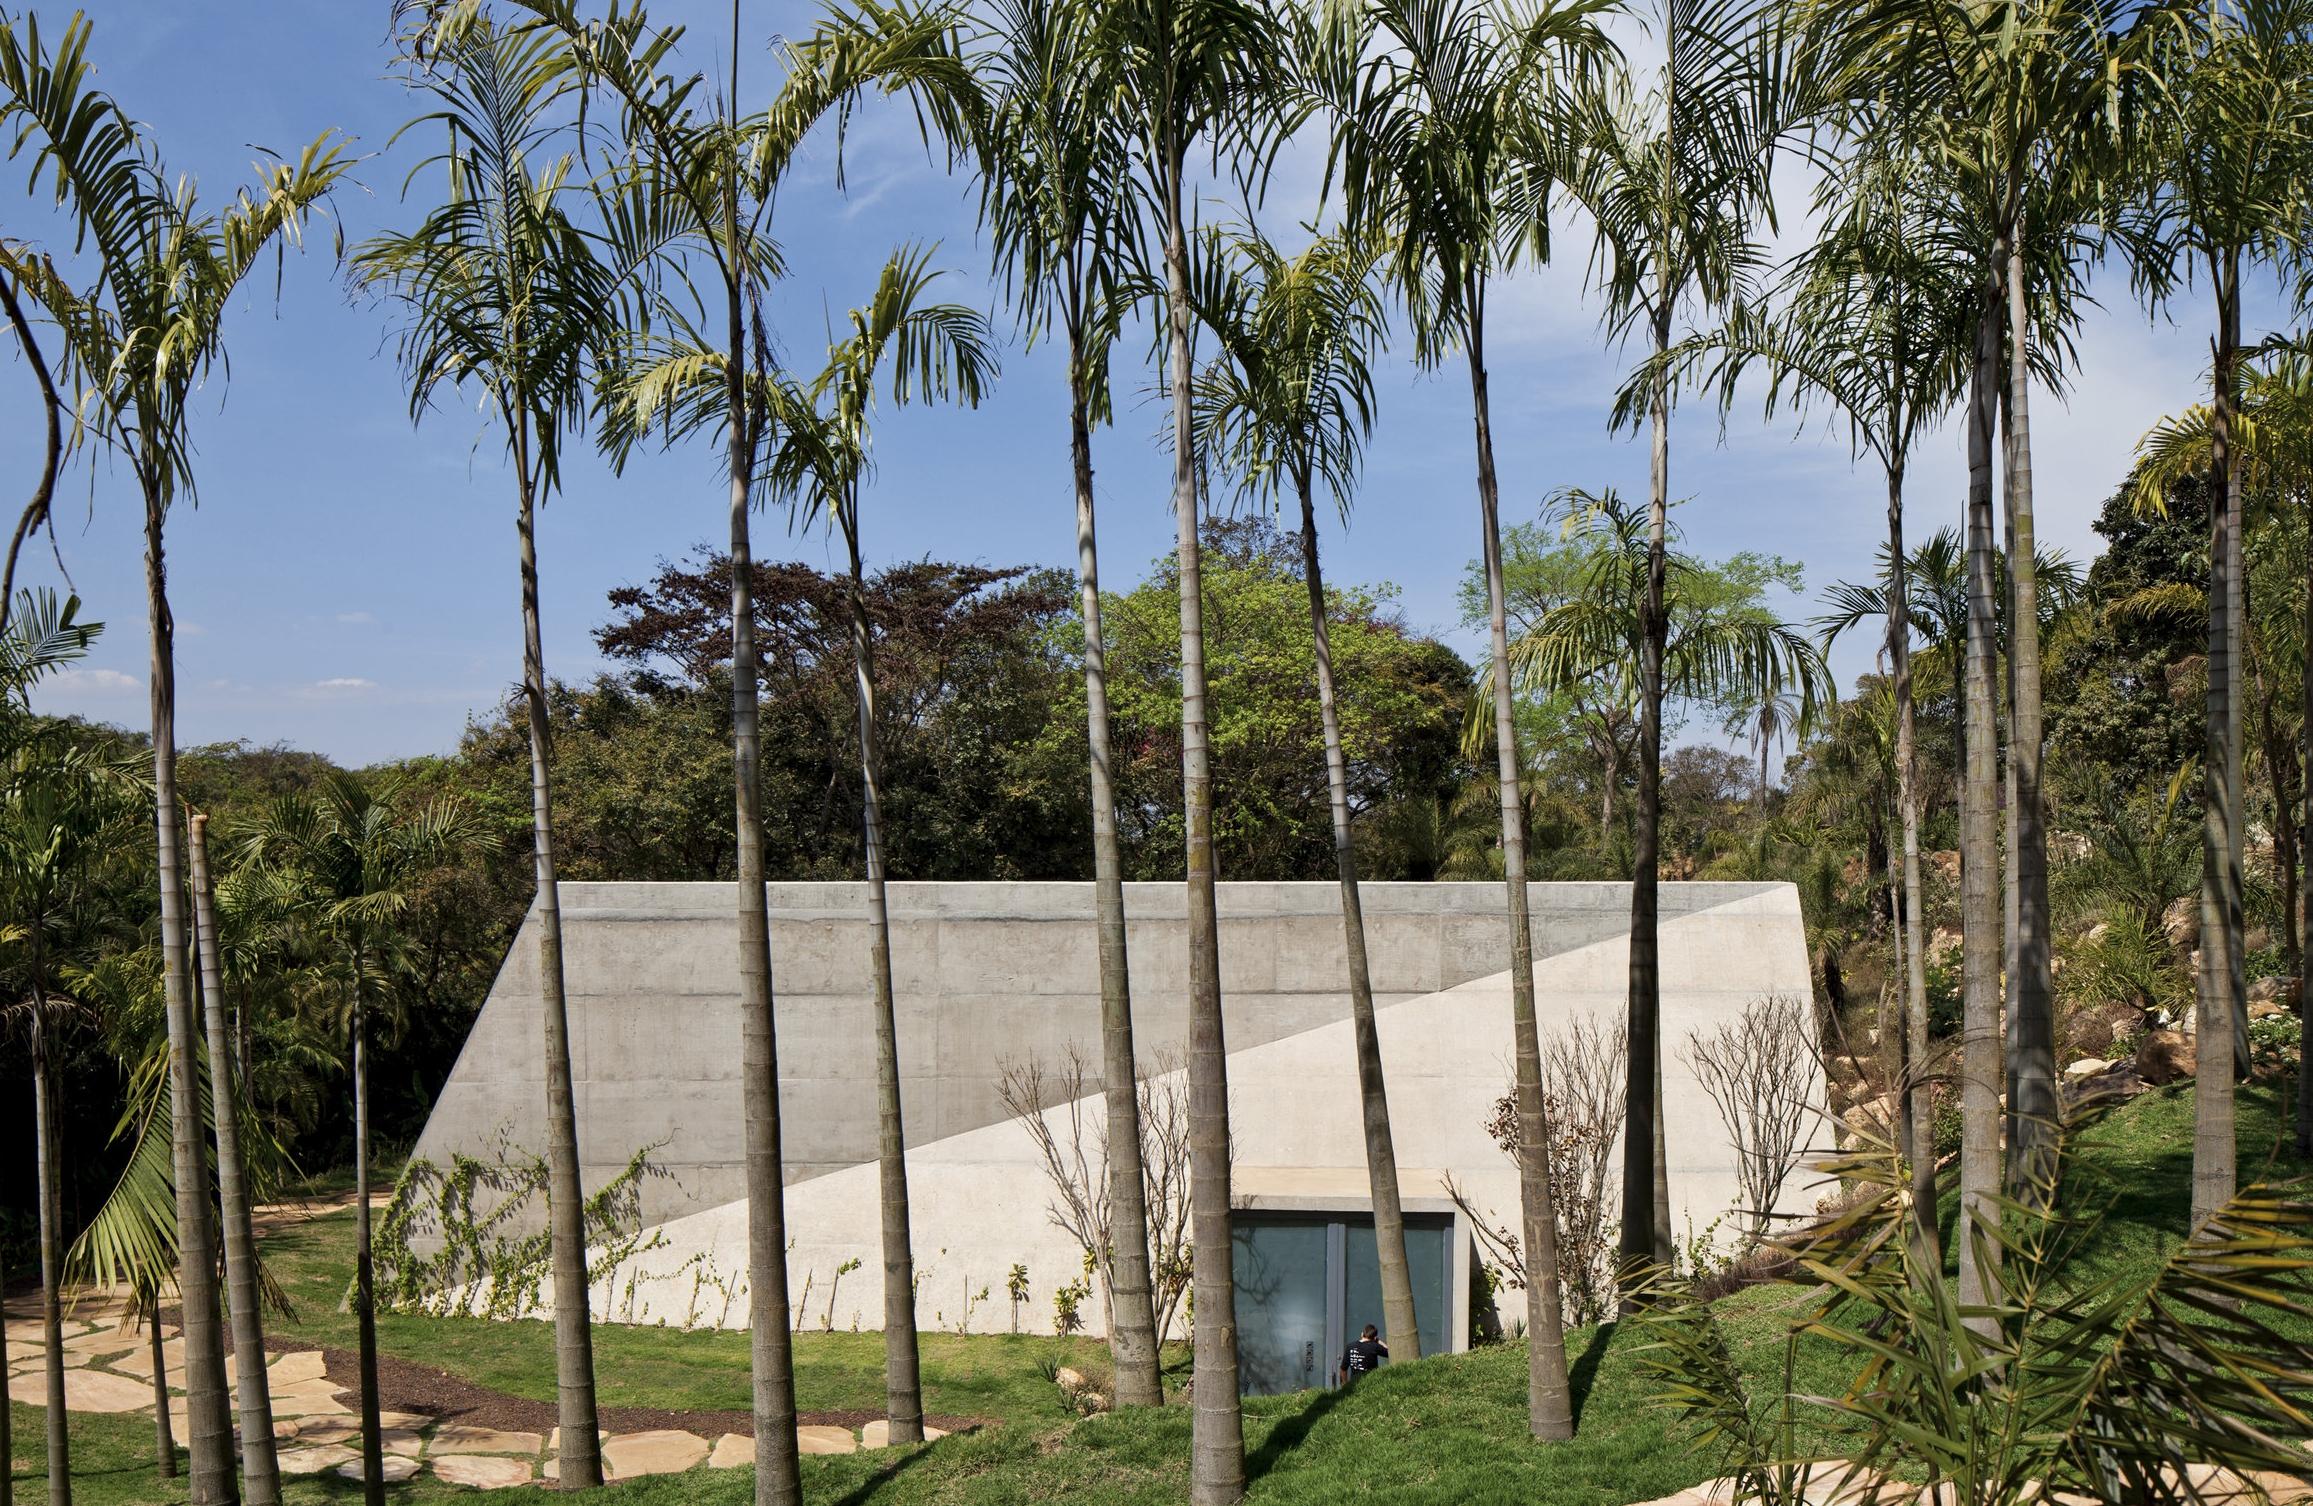 Lygia Pape Pavilion by Rizoma Arquitetura at the Inhotim Institute